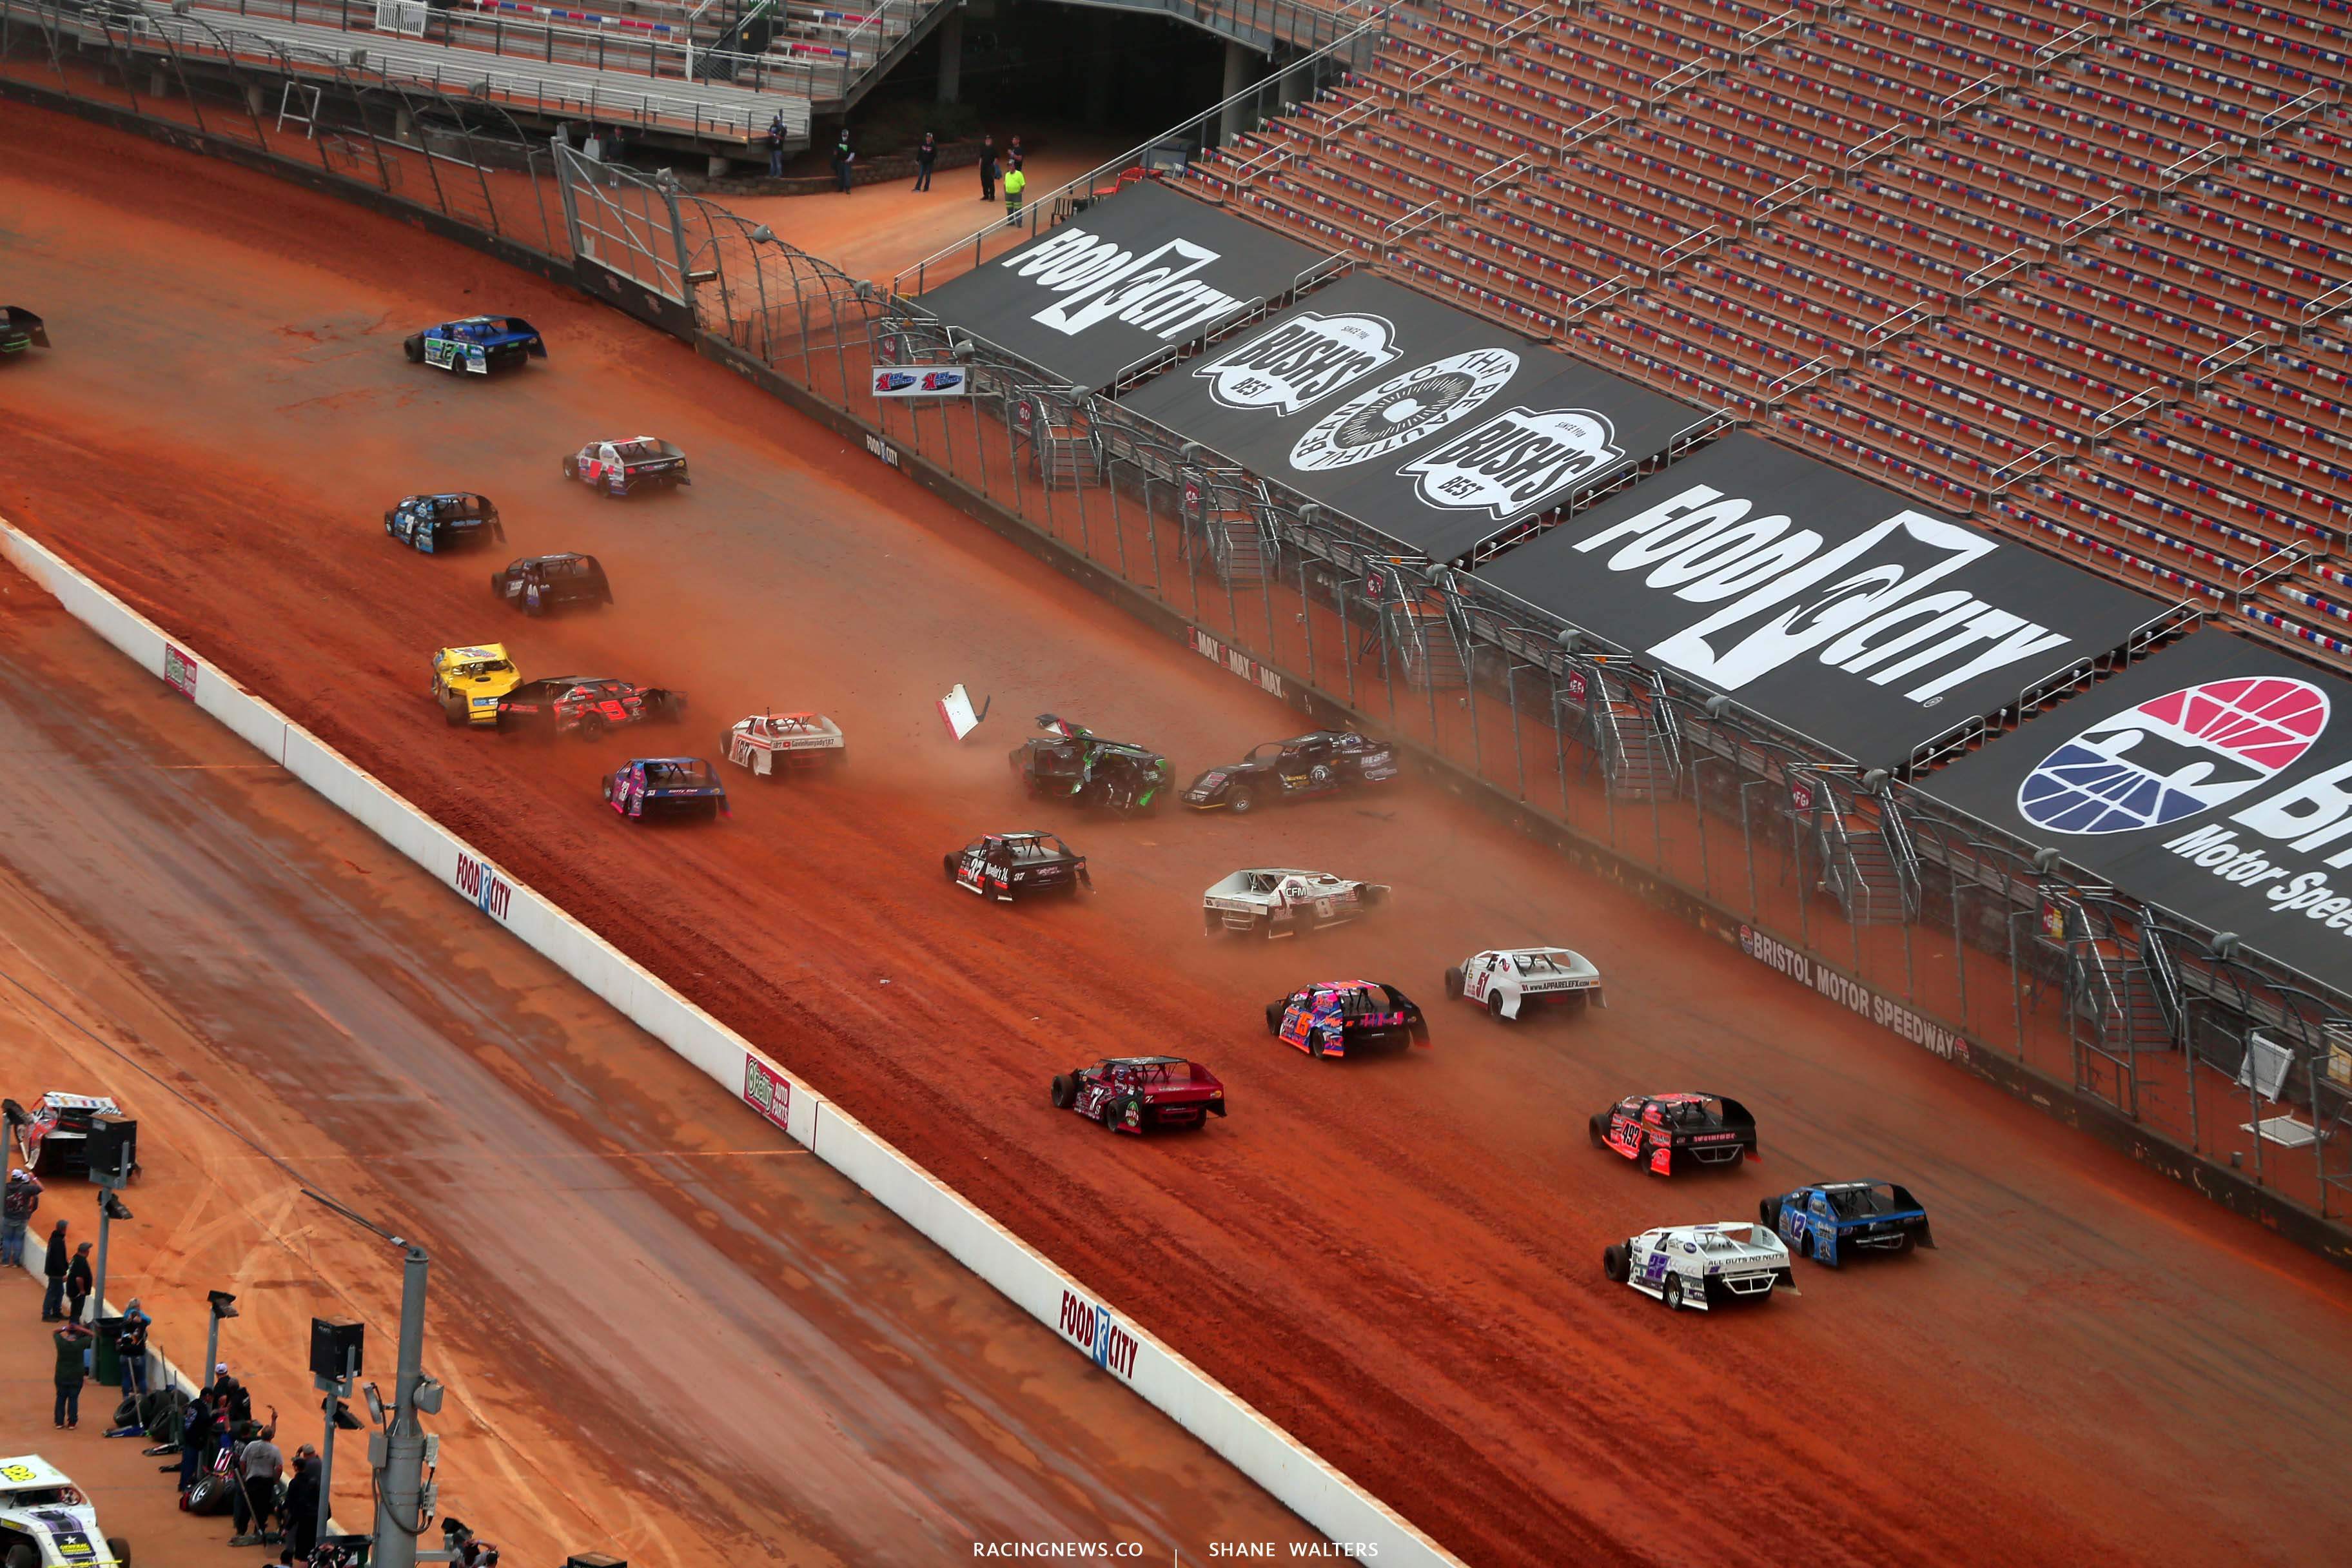 O - Dirt modified crash at Bristol Motor Speedway dirt track